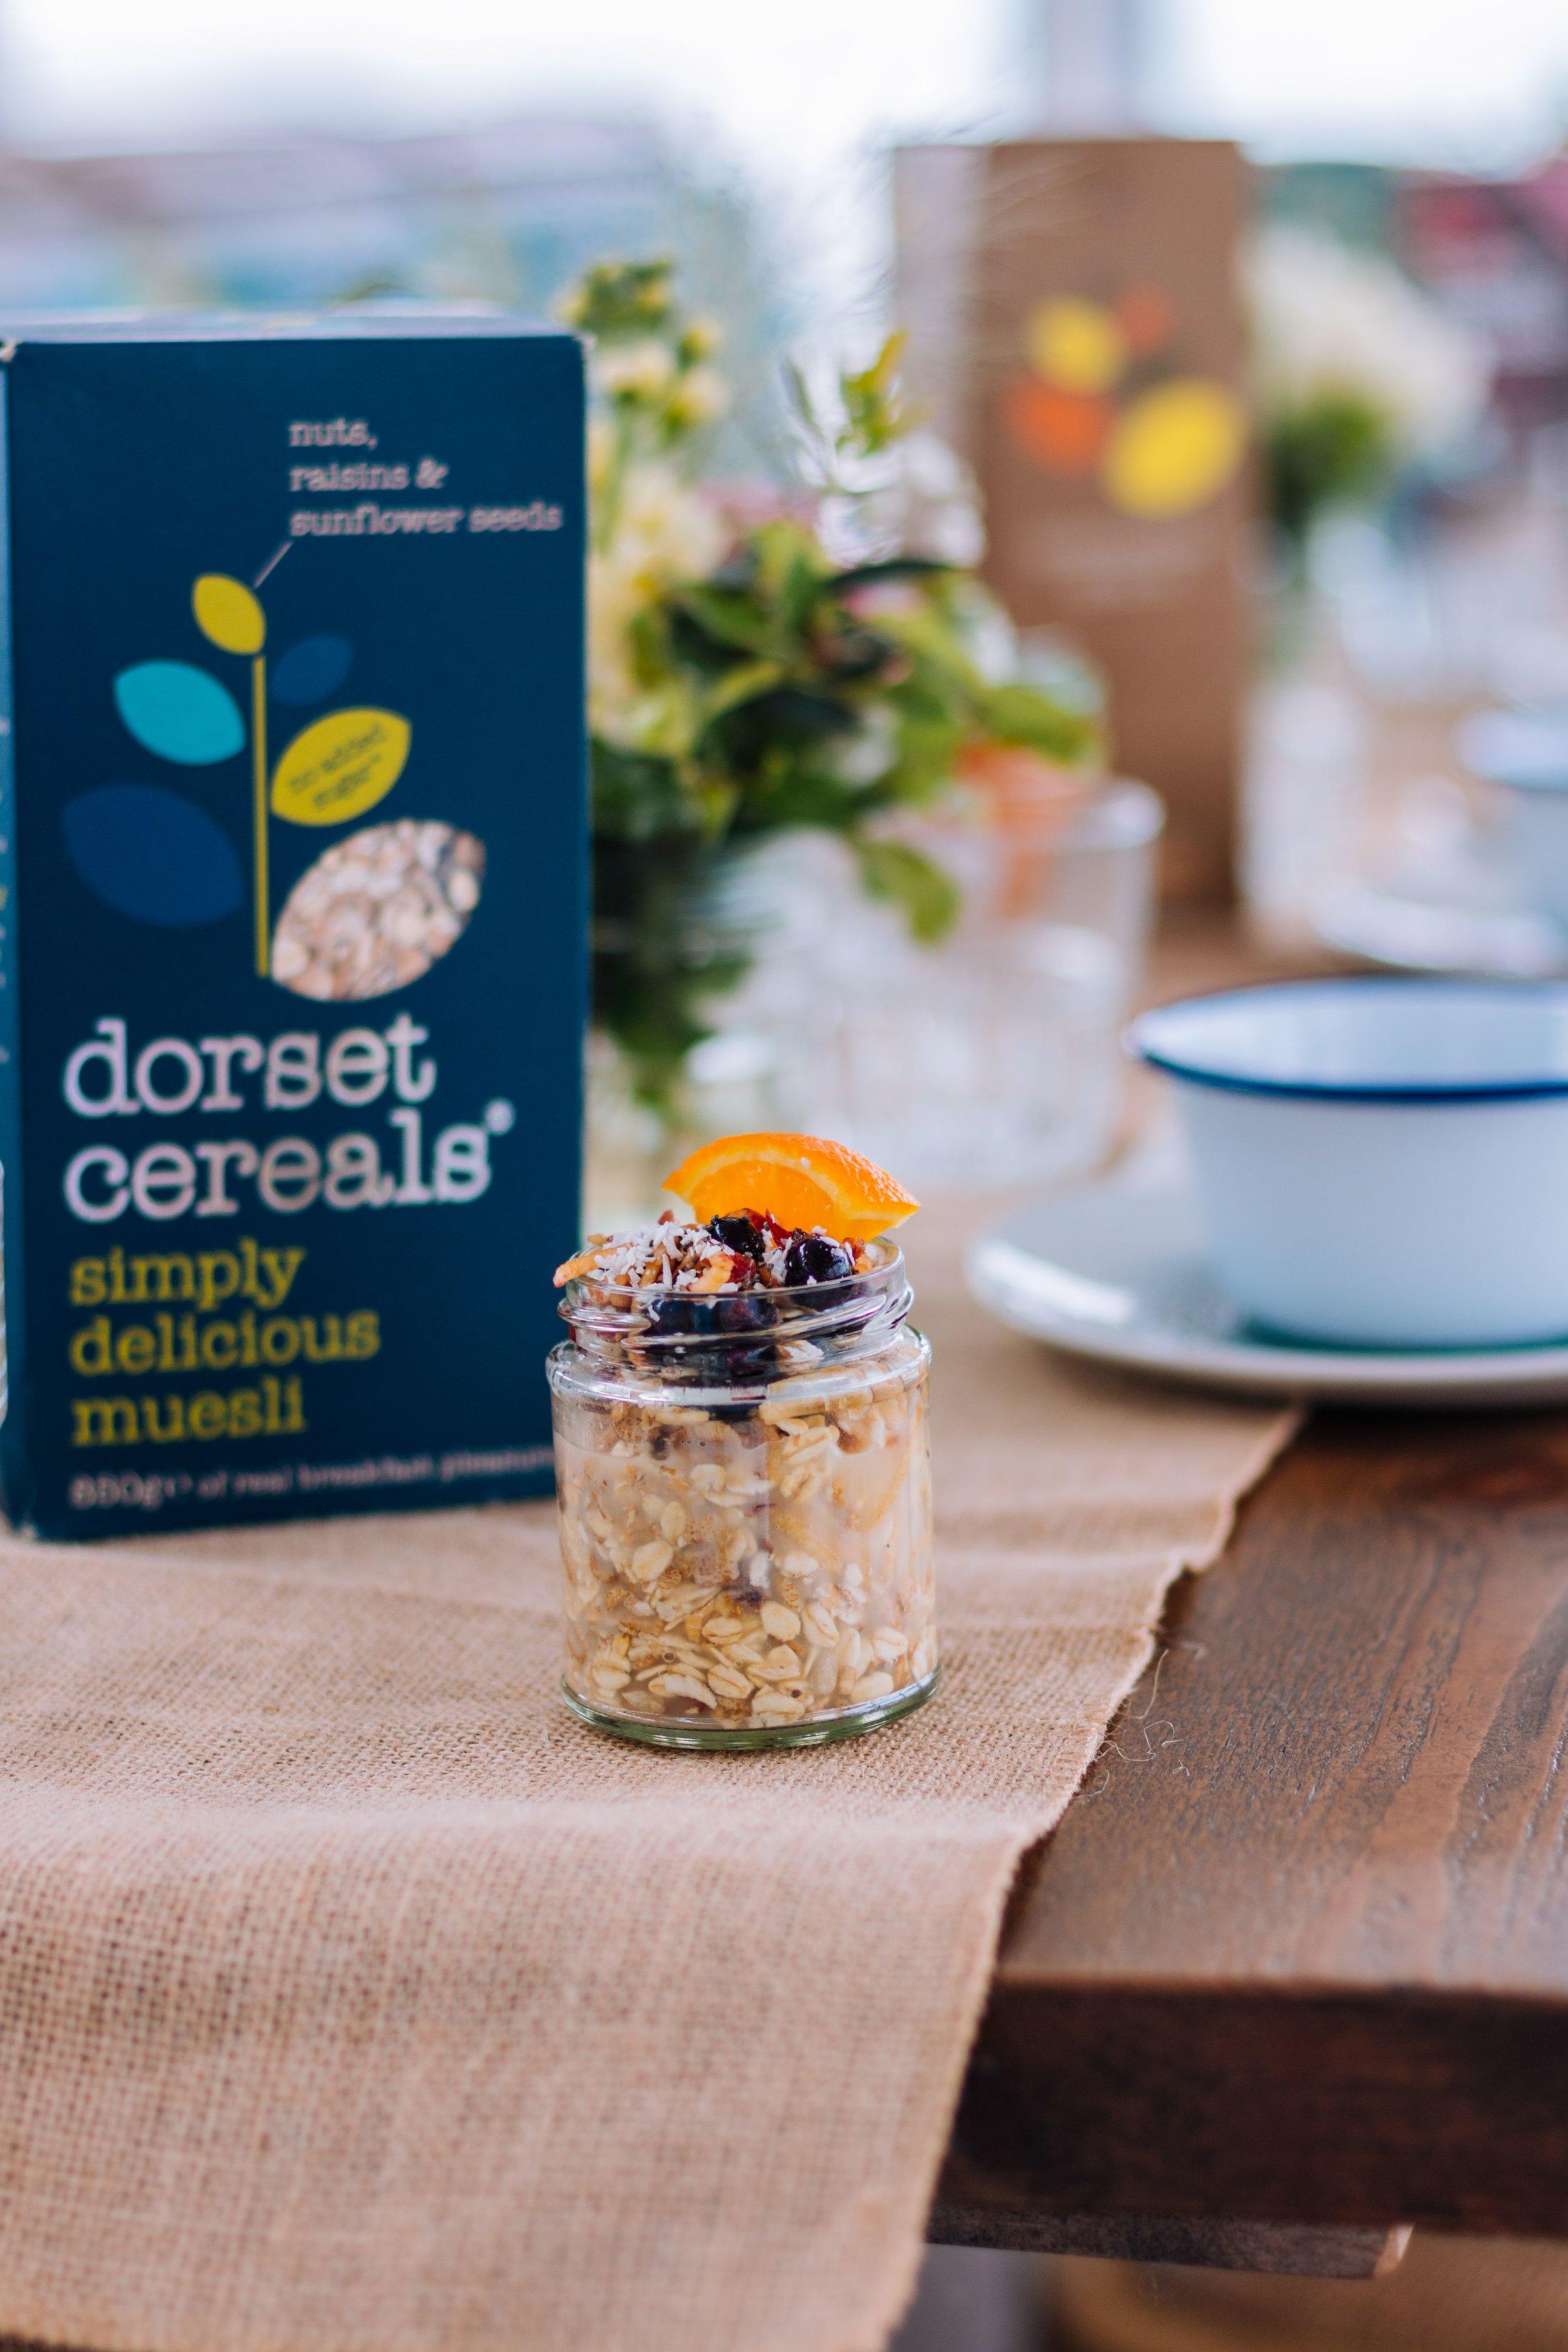 mums-the-word-dorset-cereals-brighton-4 (1).jpg